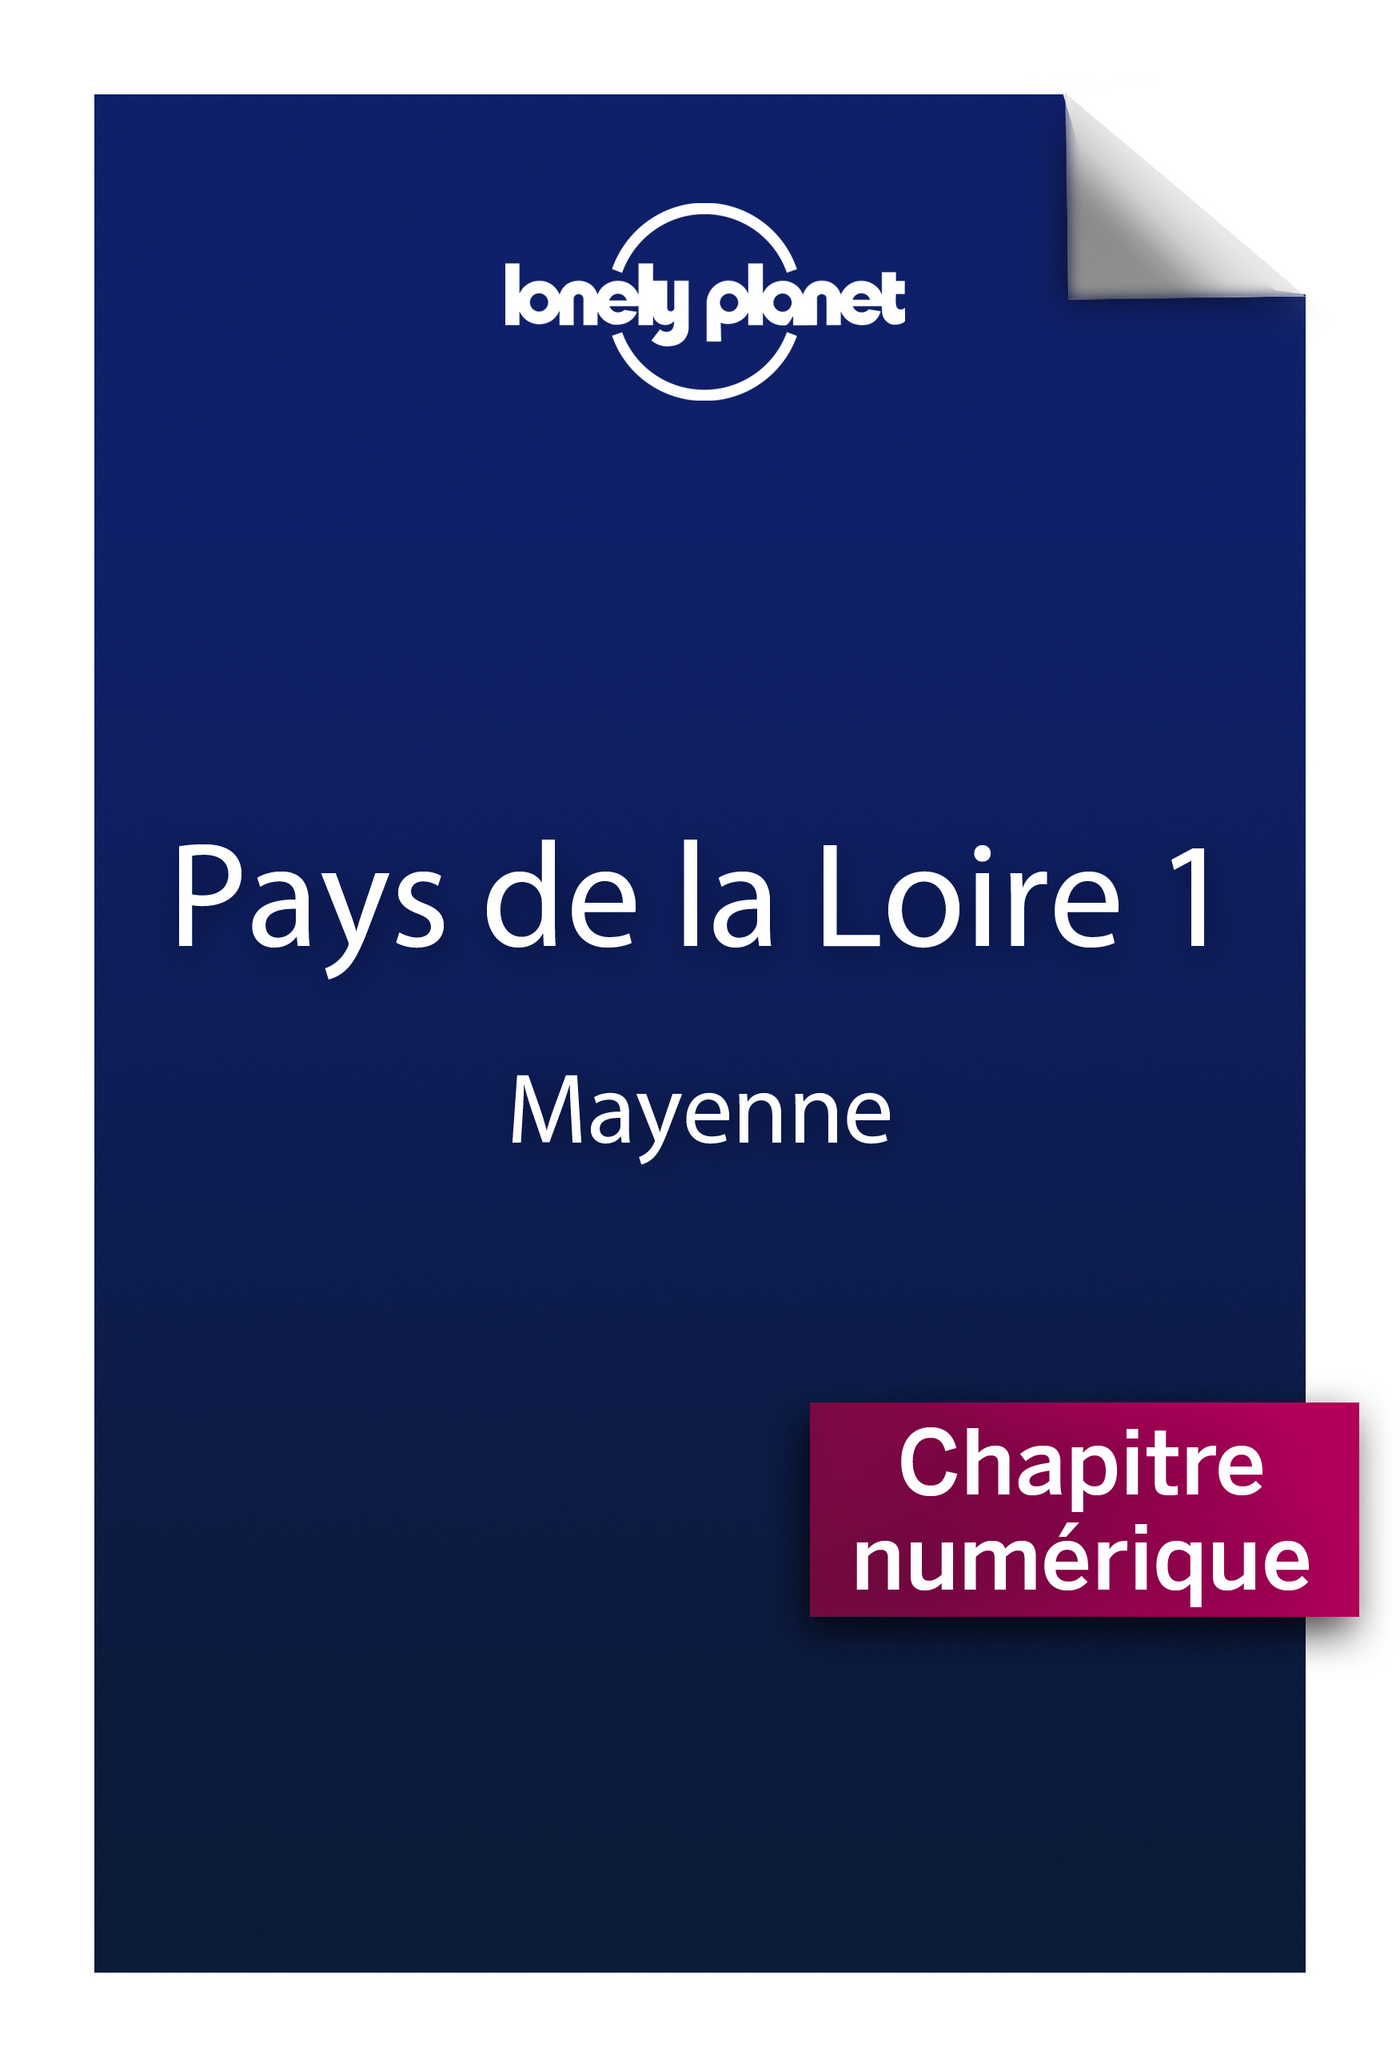 Pays de la Loire 1 - Mayenne